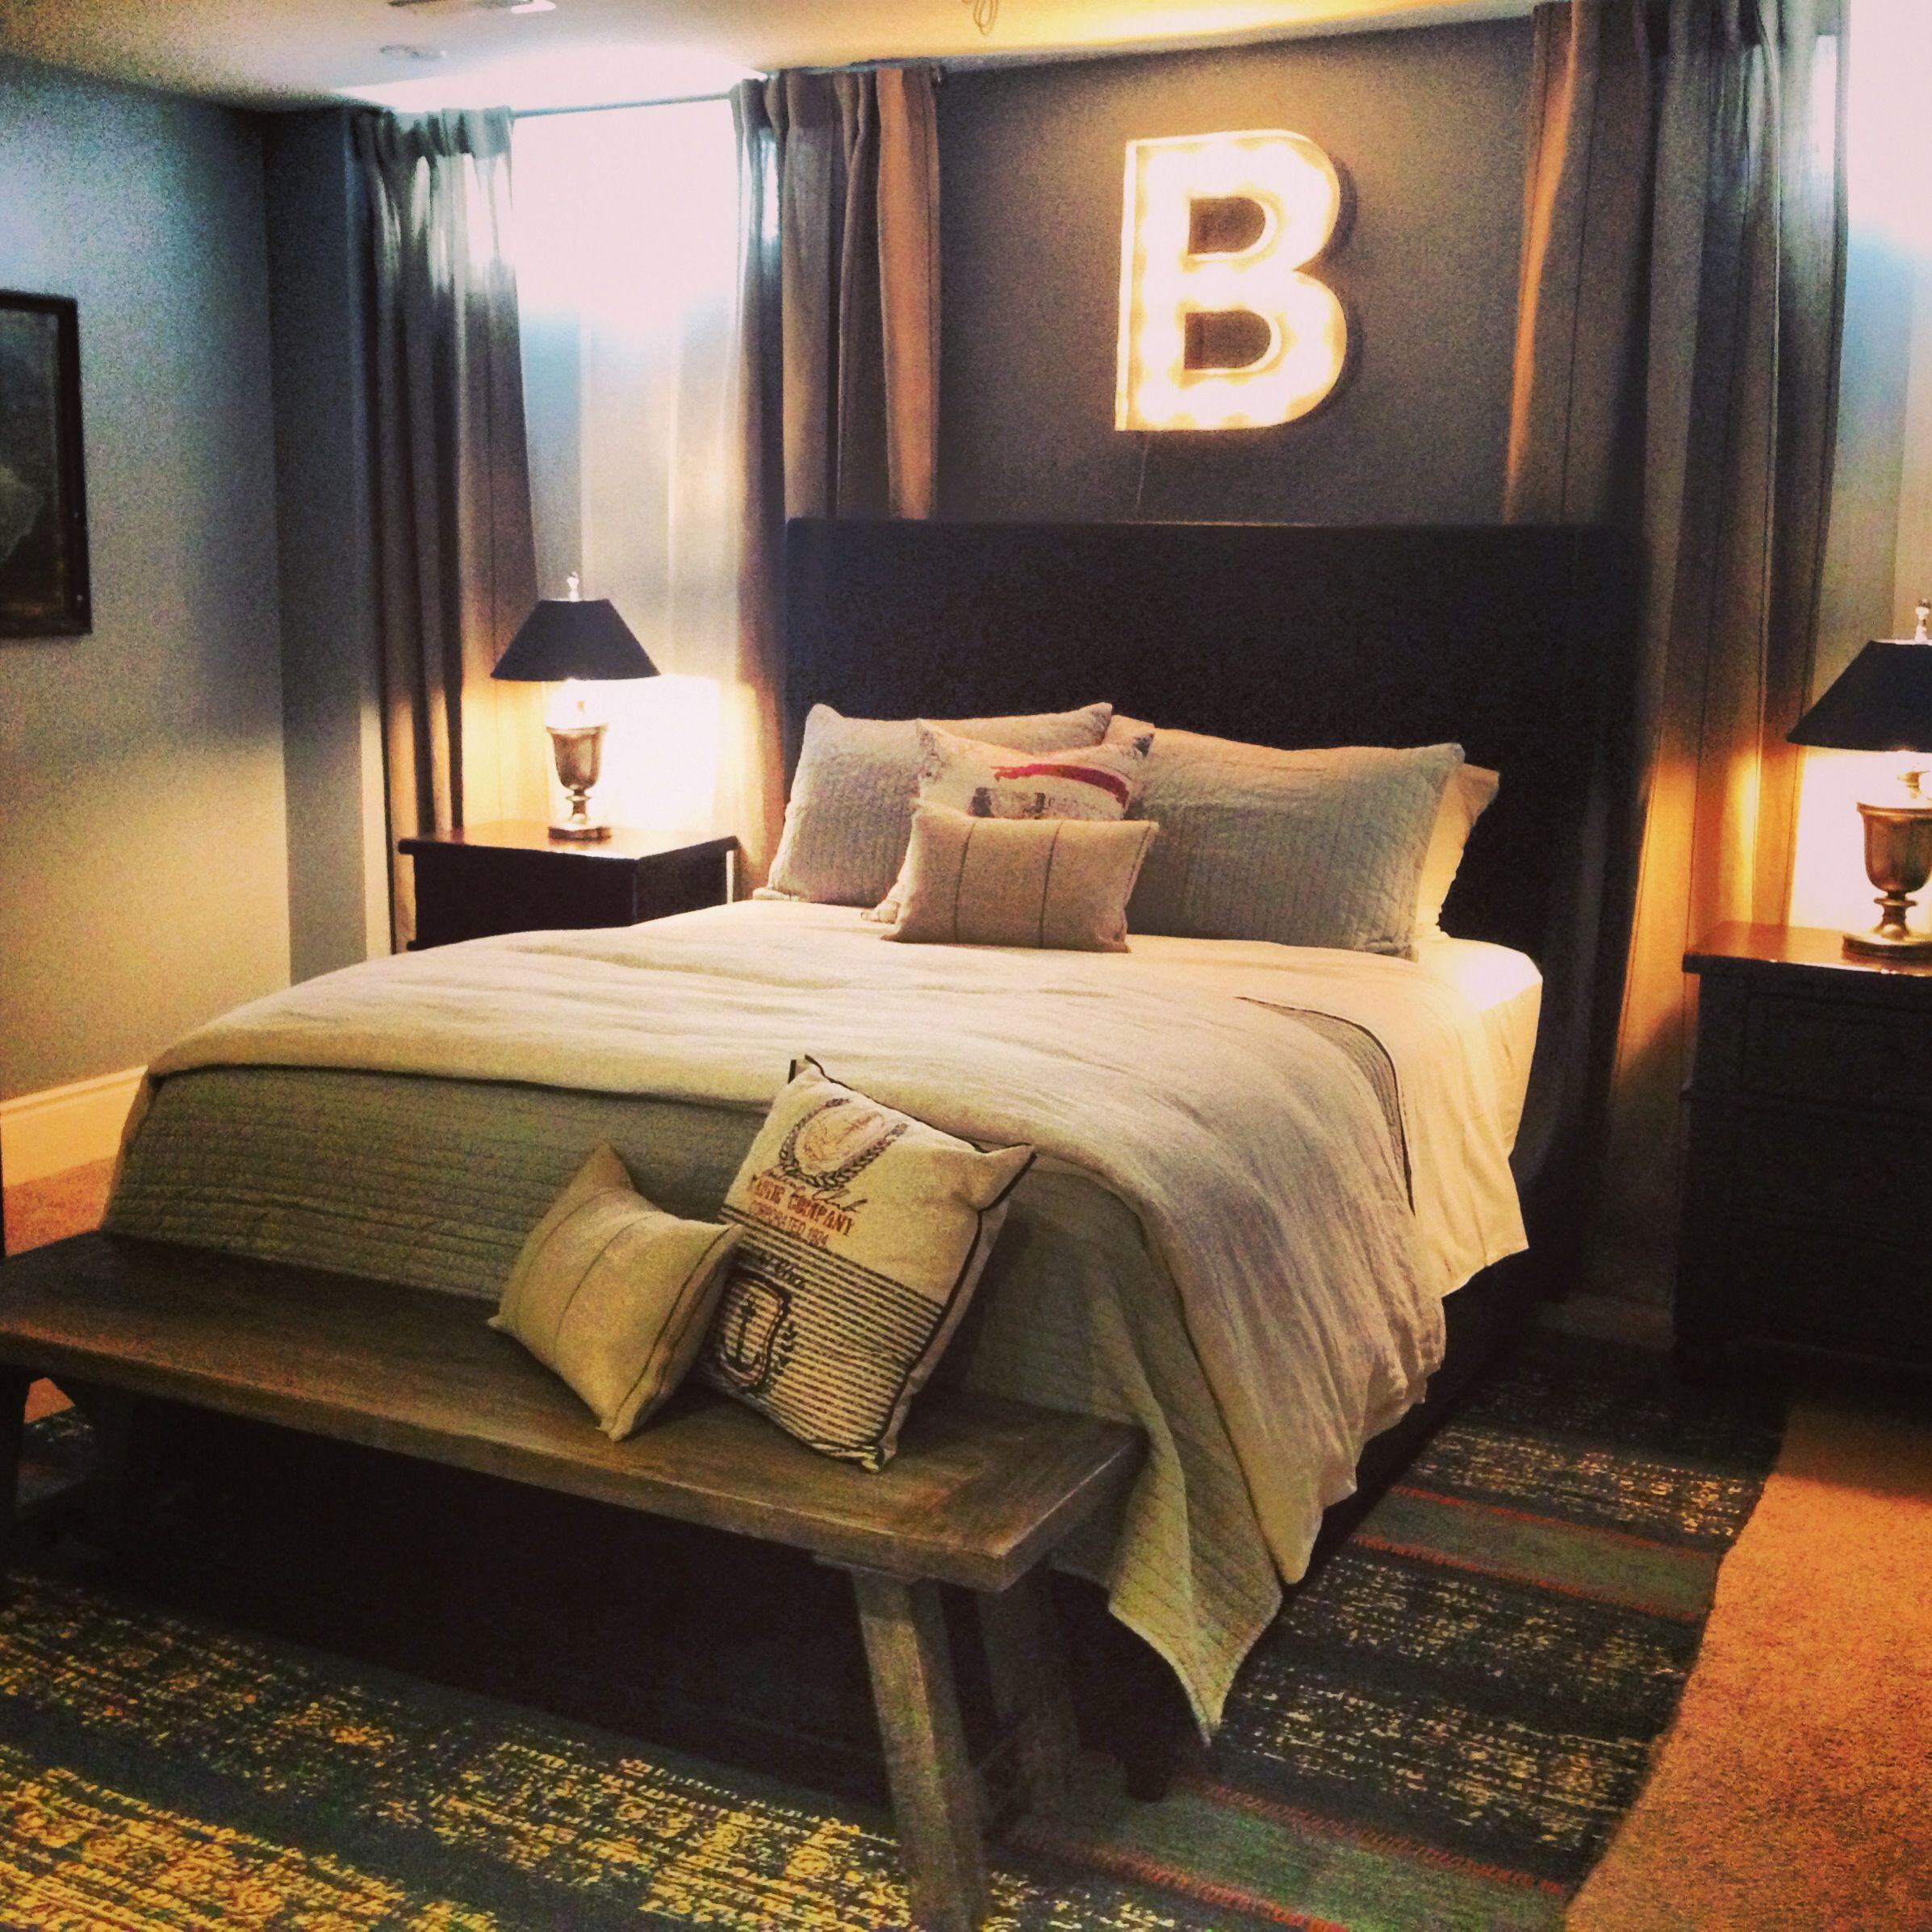 Basement Bedroom: Basement Bedroom For A 15 Year Old Boy:)